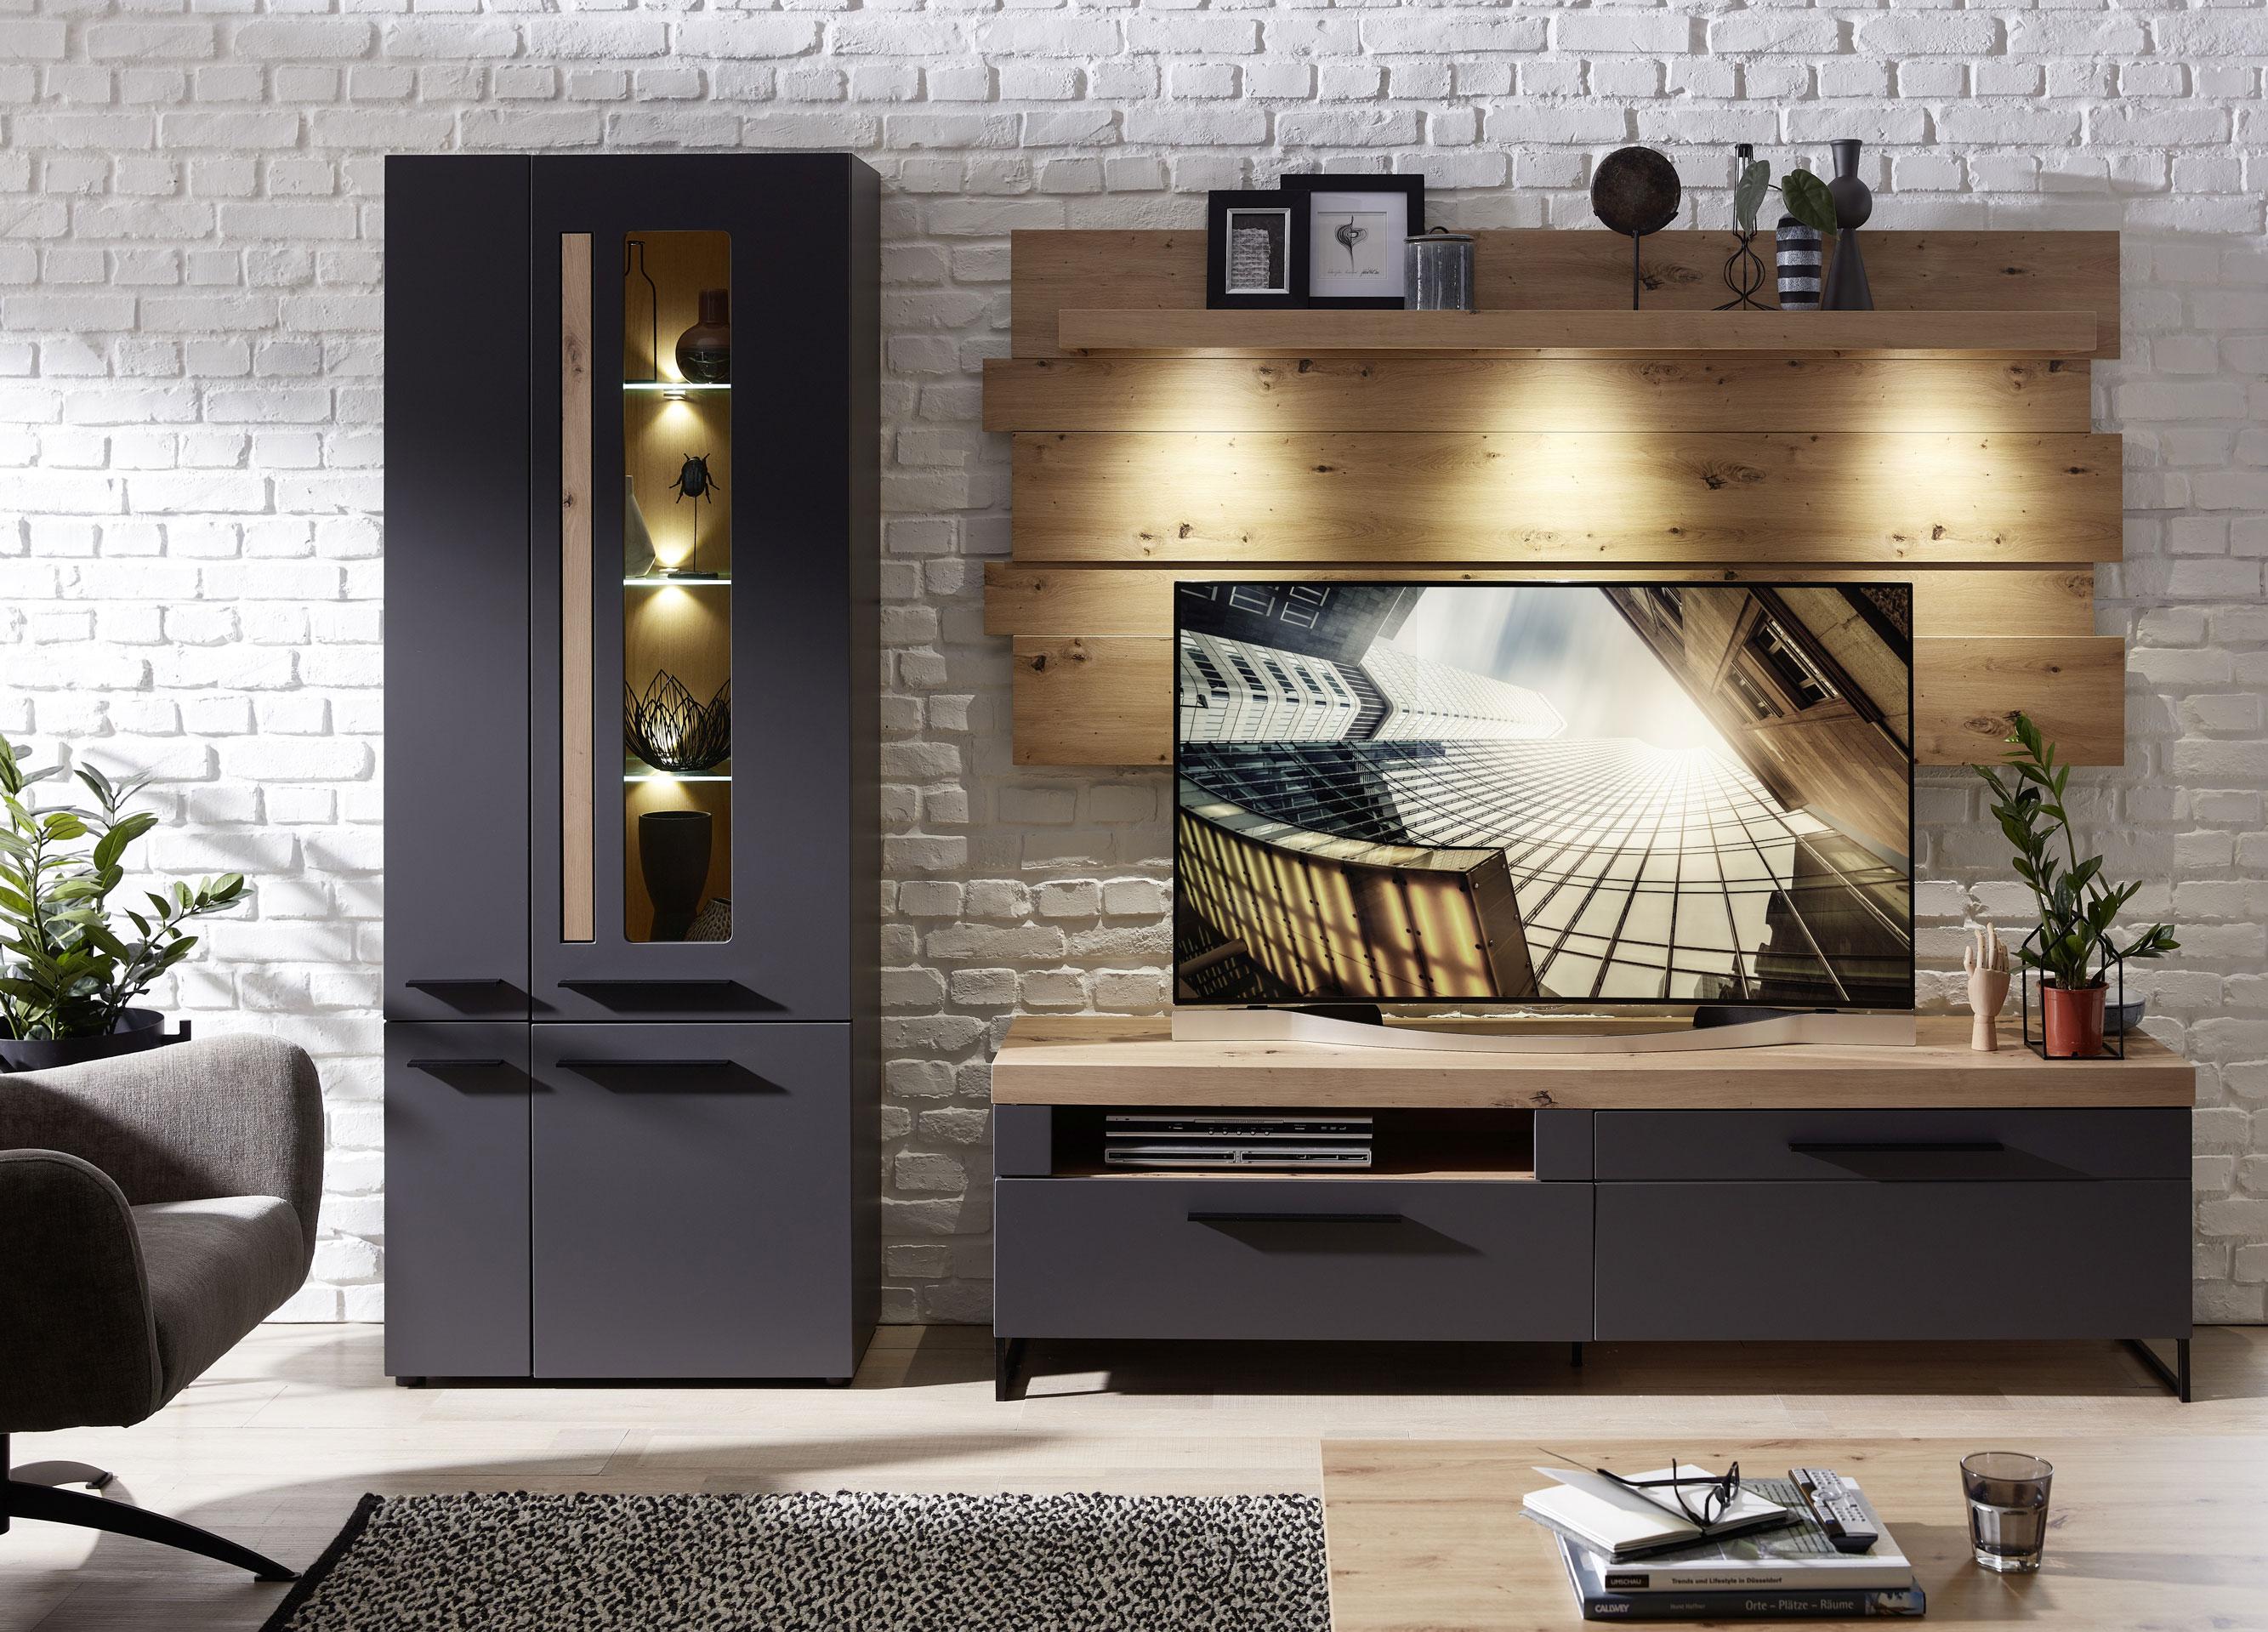 LOFT-TWO TV-/ Wohnlösung